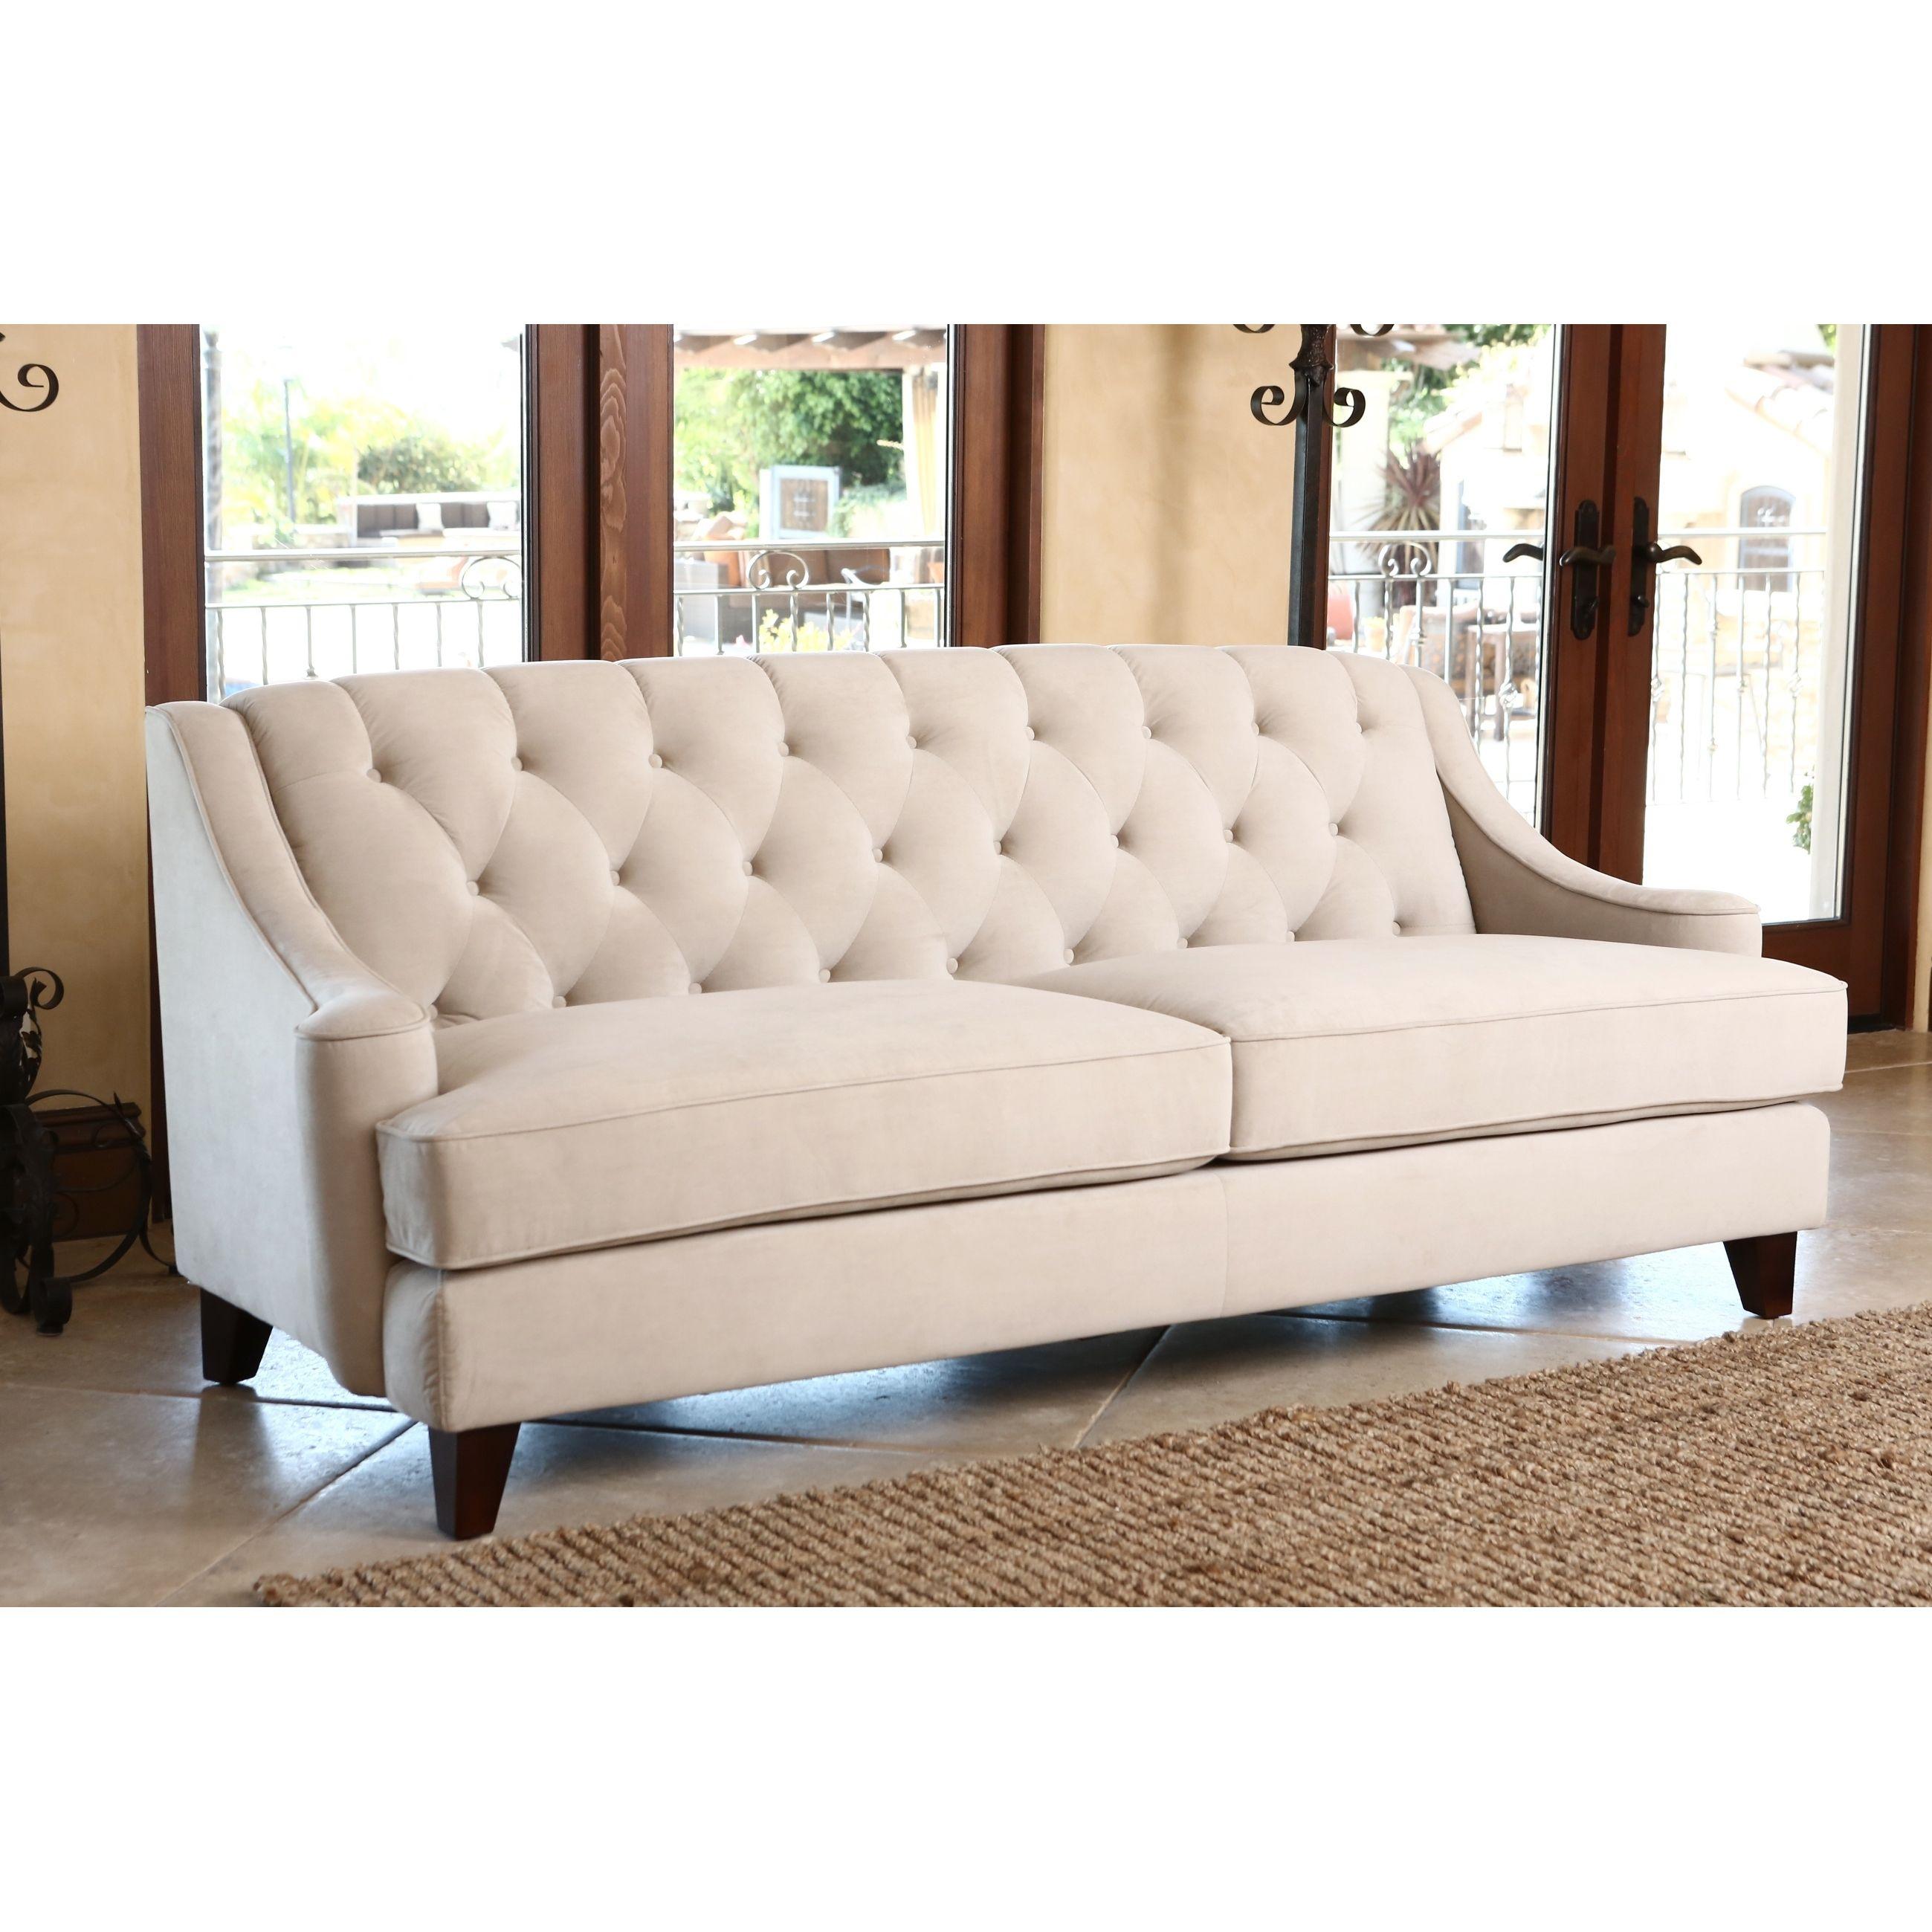 Awesome Abbyson Living Claridge Beige Velvet Fabric Tufted Sofa   Overstock™  Shopping   Great Deals On Abbyson Living Sofas U0026 Loveseats